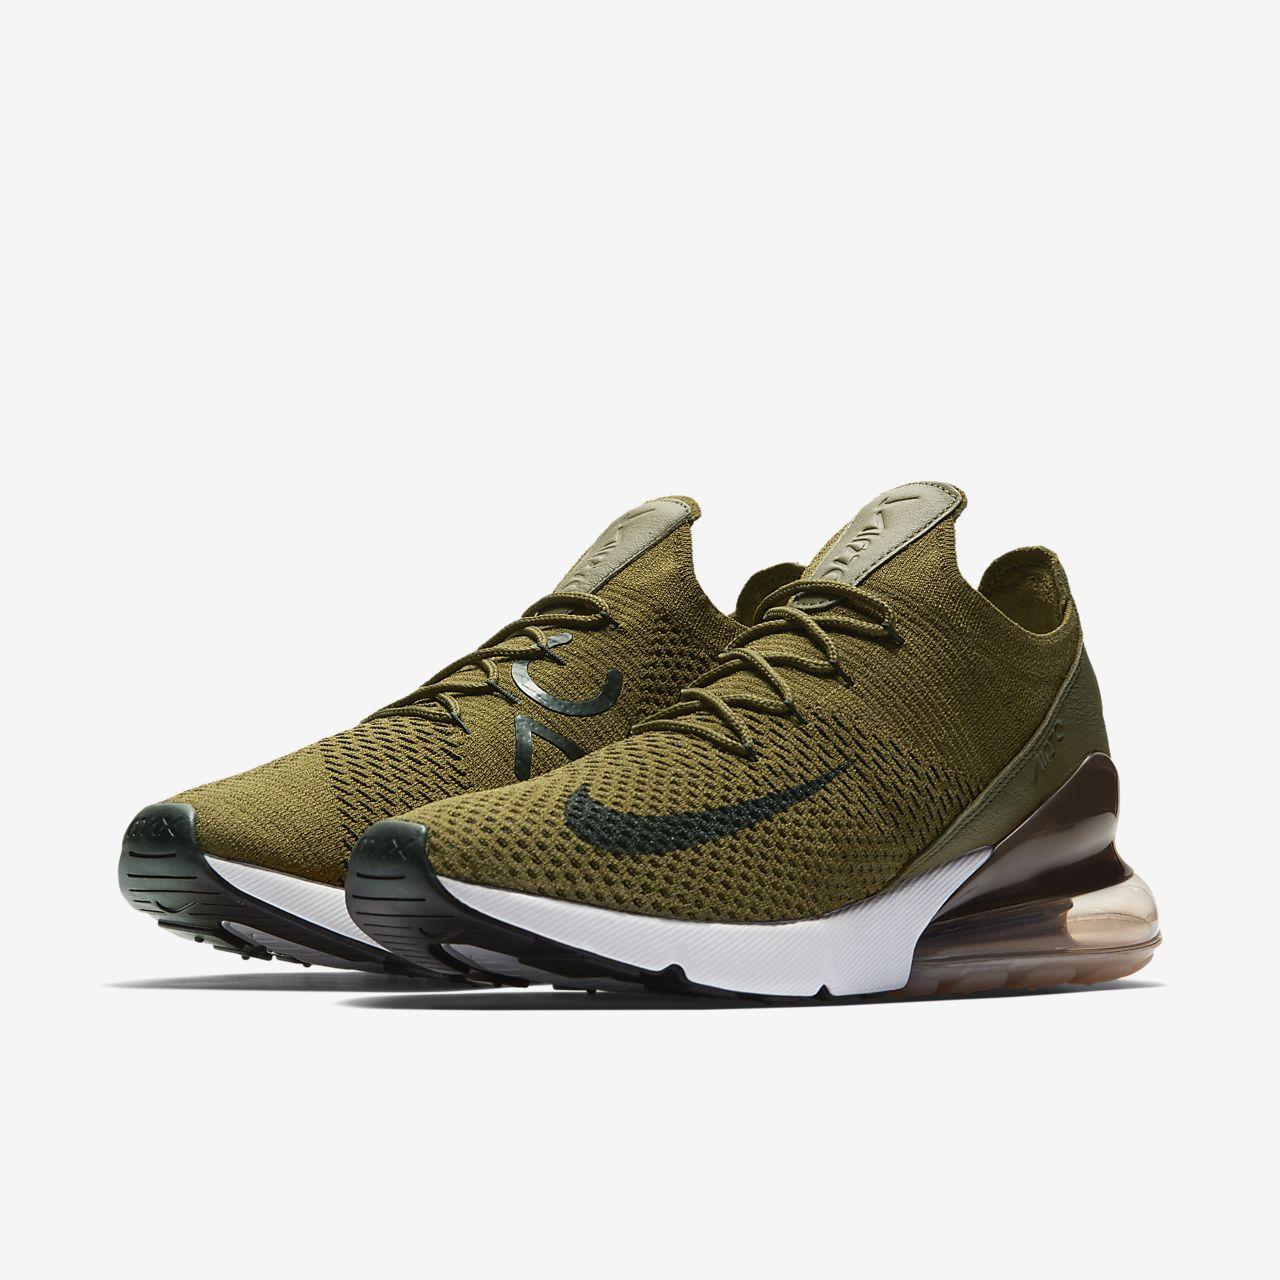 69446ee23237 Nike Air Max 270 Flyknit Men s Shoe. Nike.com AT